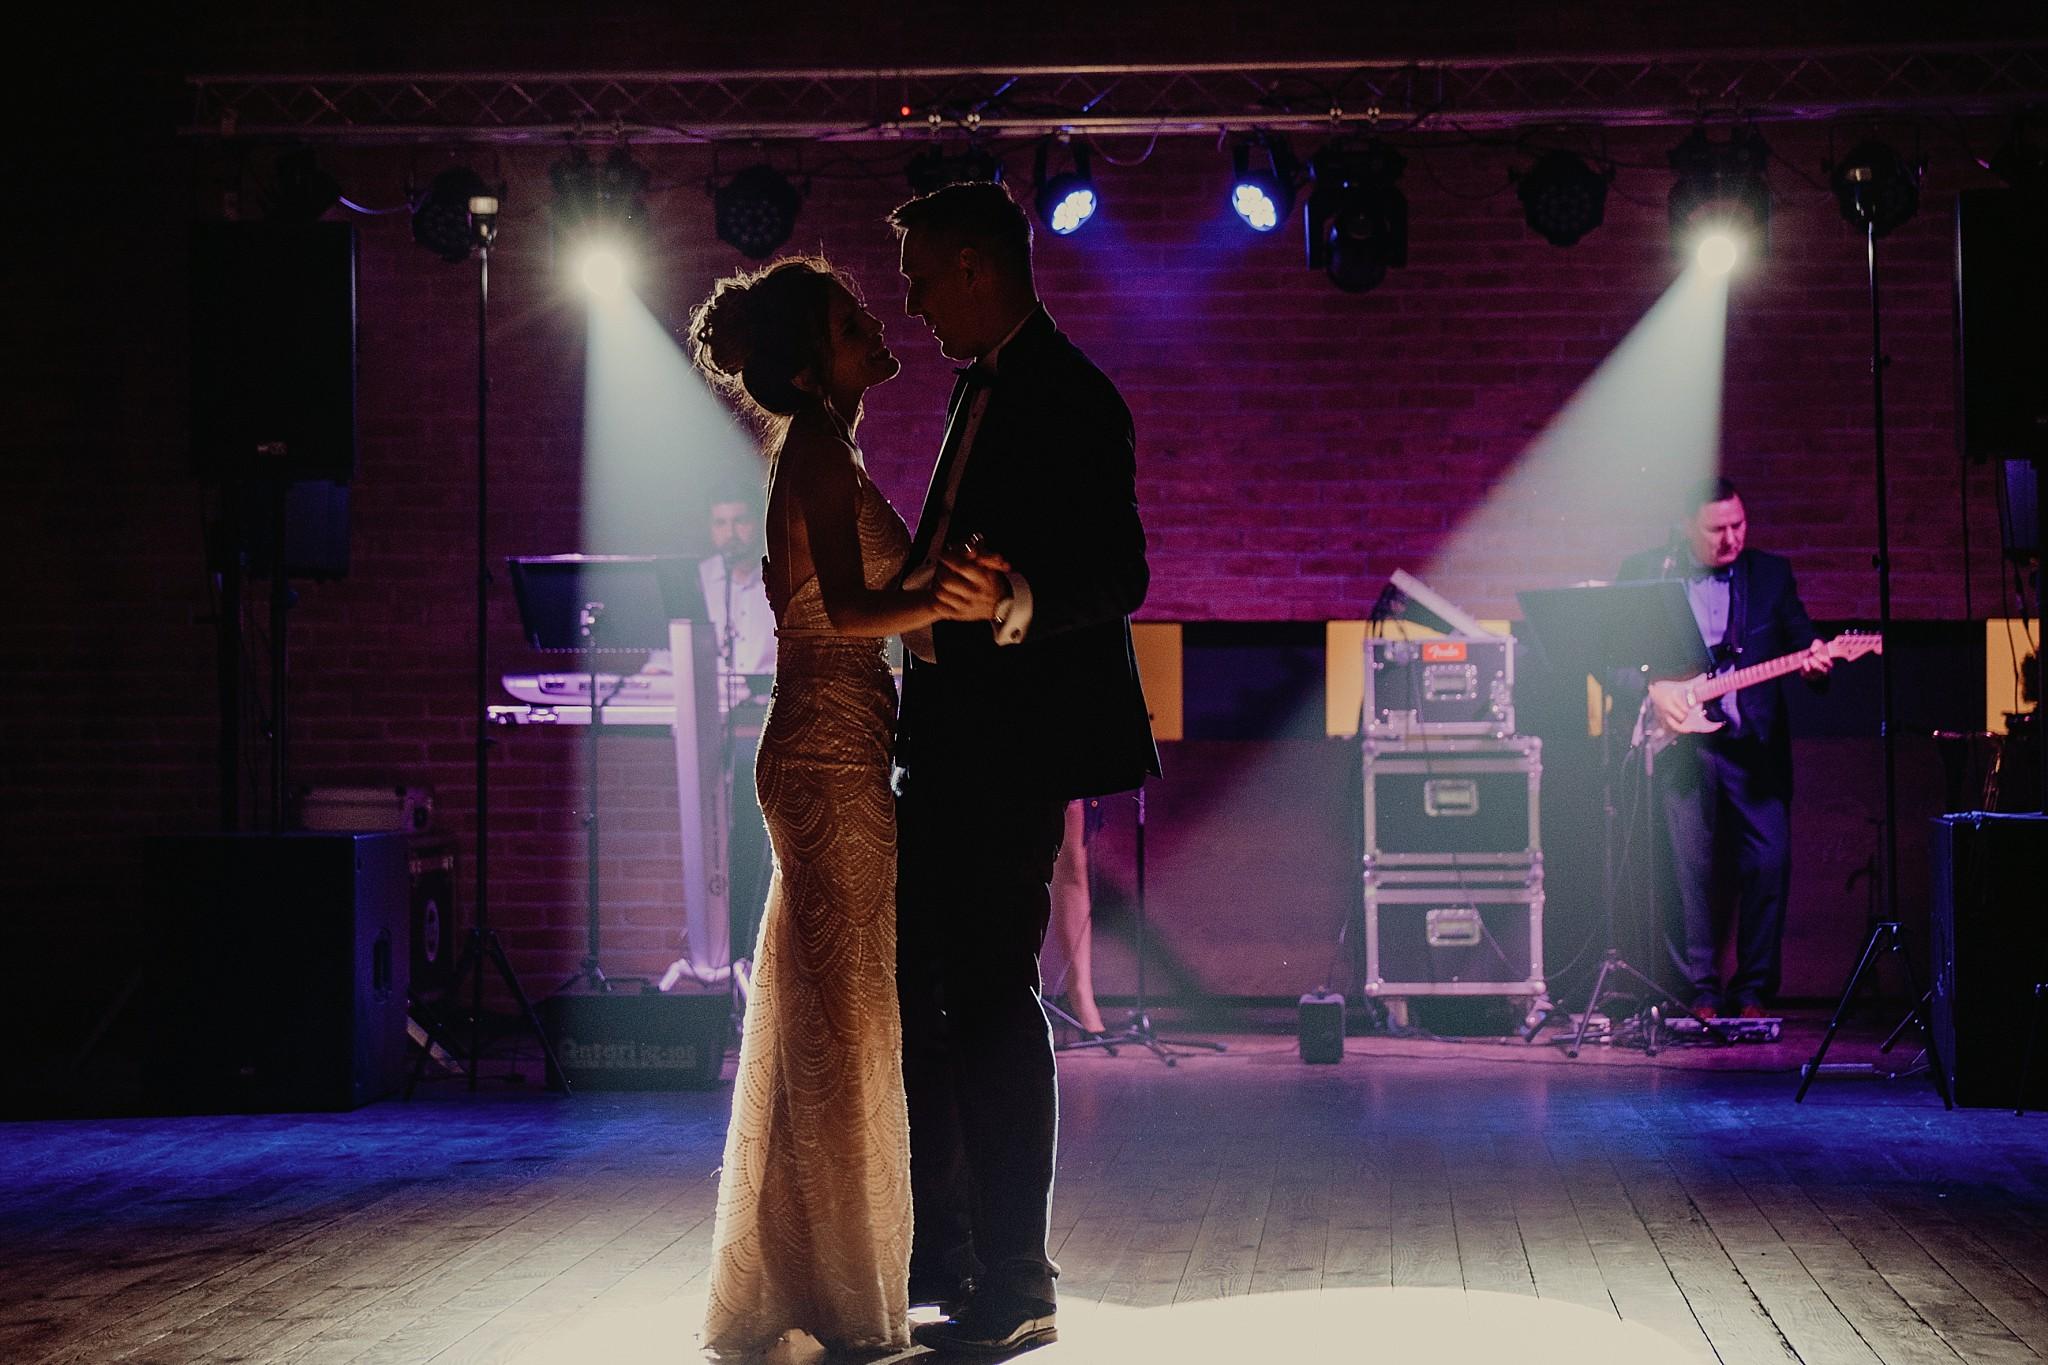 fotograf poznan wesele dobra truskawka piekne wesele pod poznaniem wesele w dobrej truskawce piekna para mloda slub marzen slub koronawirus slub listopad wesele koronawirus 507